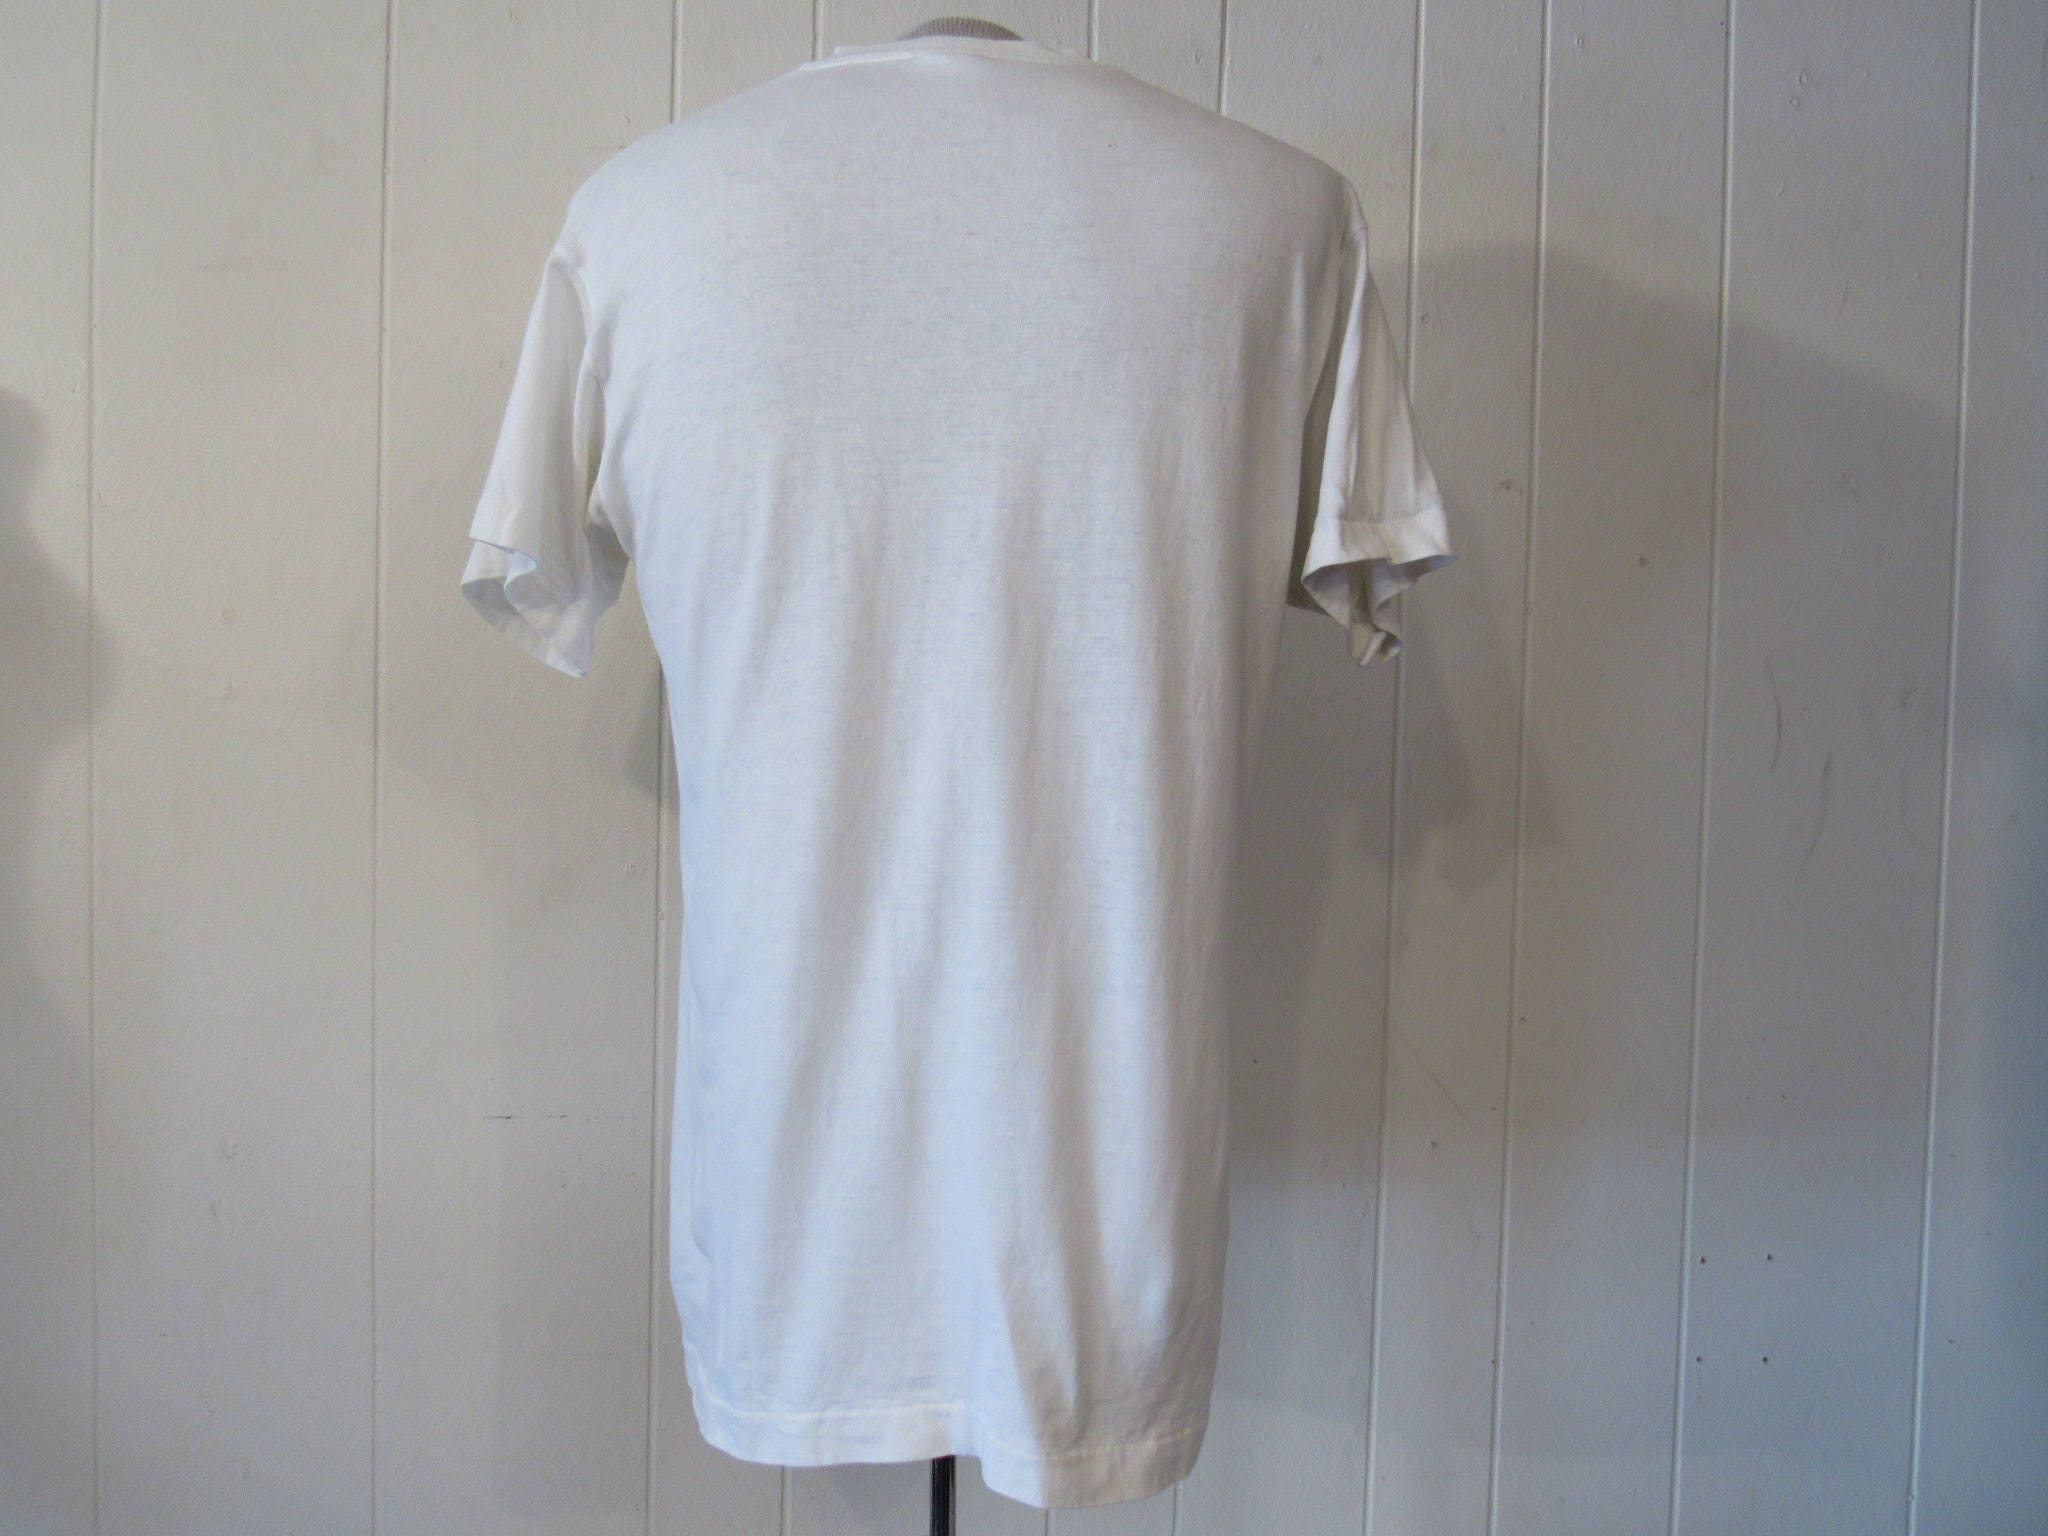 Vintage T Shirt Football T Shirt Eastern Michigan T Shirt Eastern Michigan Football Vintage Clothing Medium SweatShirt